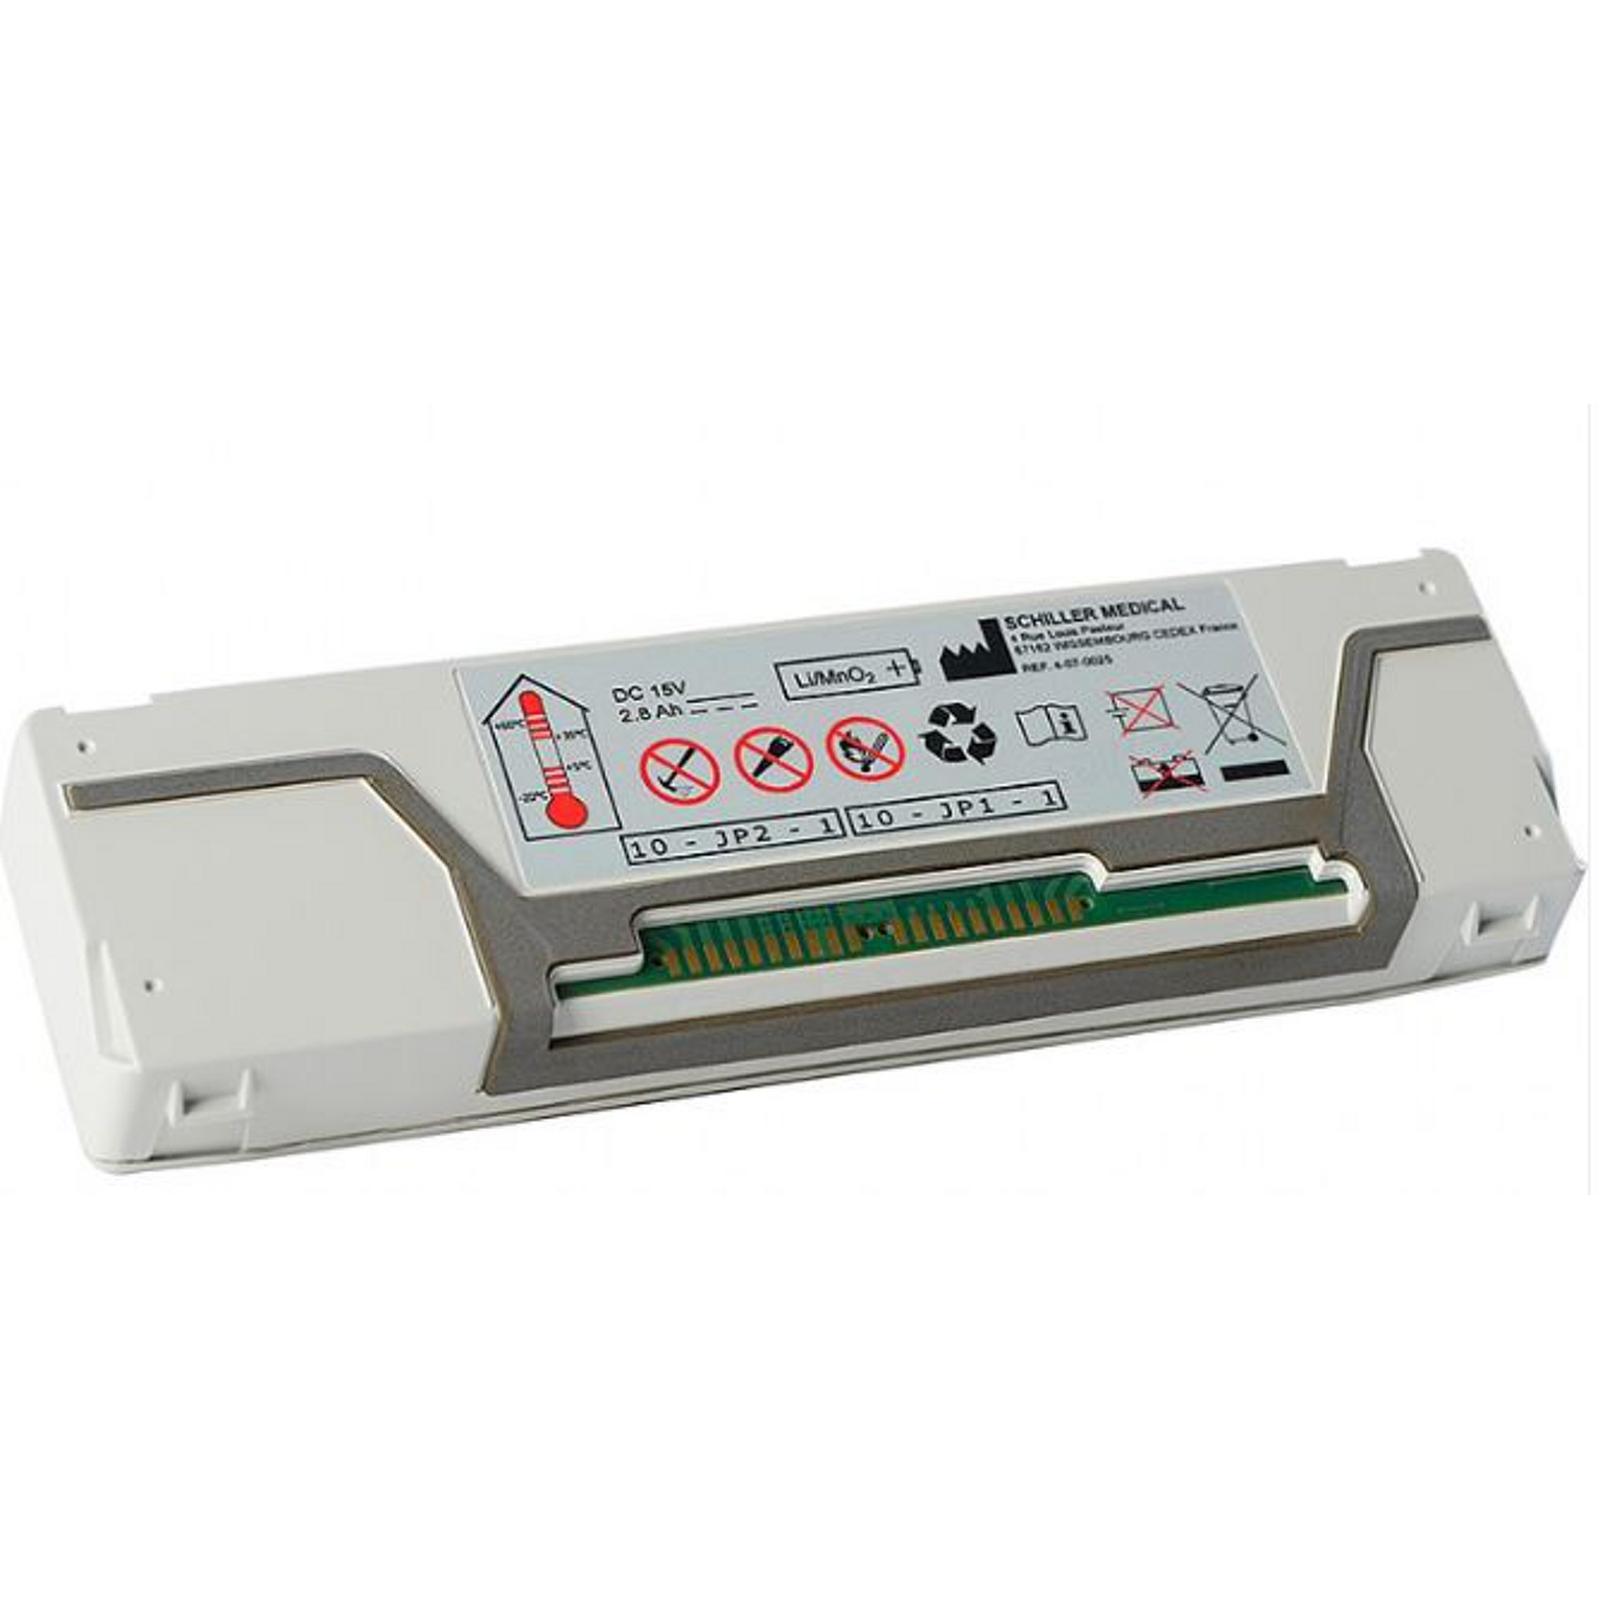 Schiller Battery pack FRED PA-1